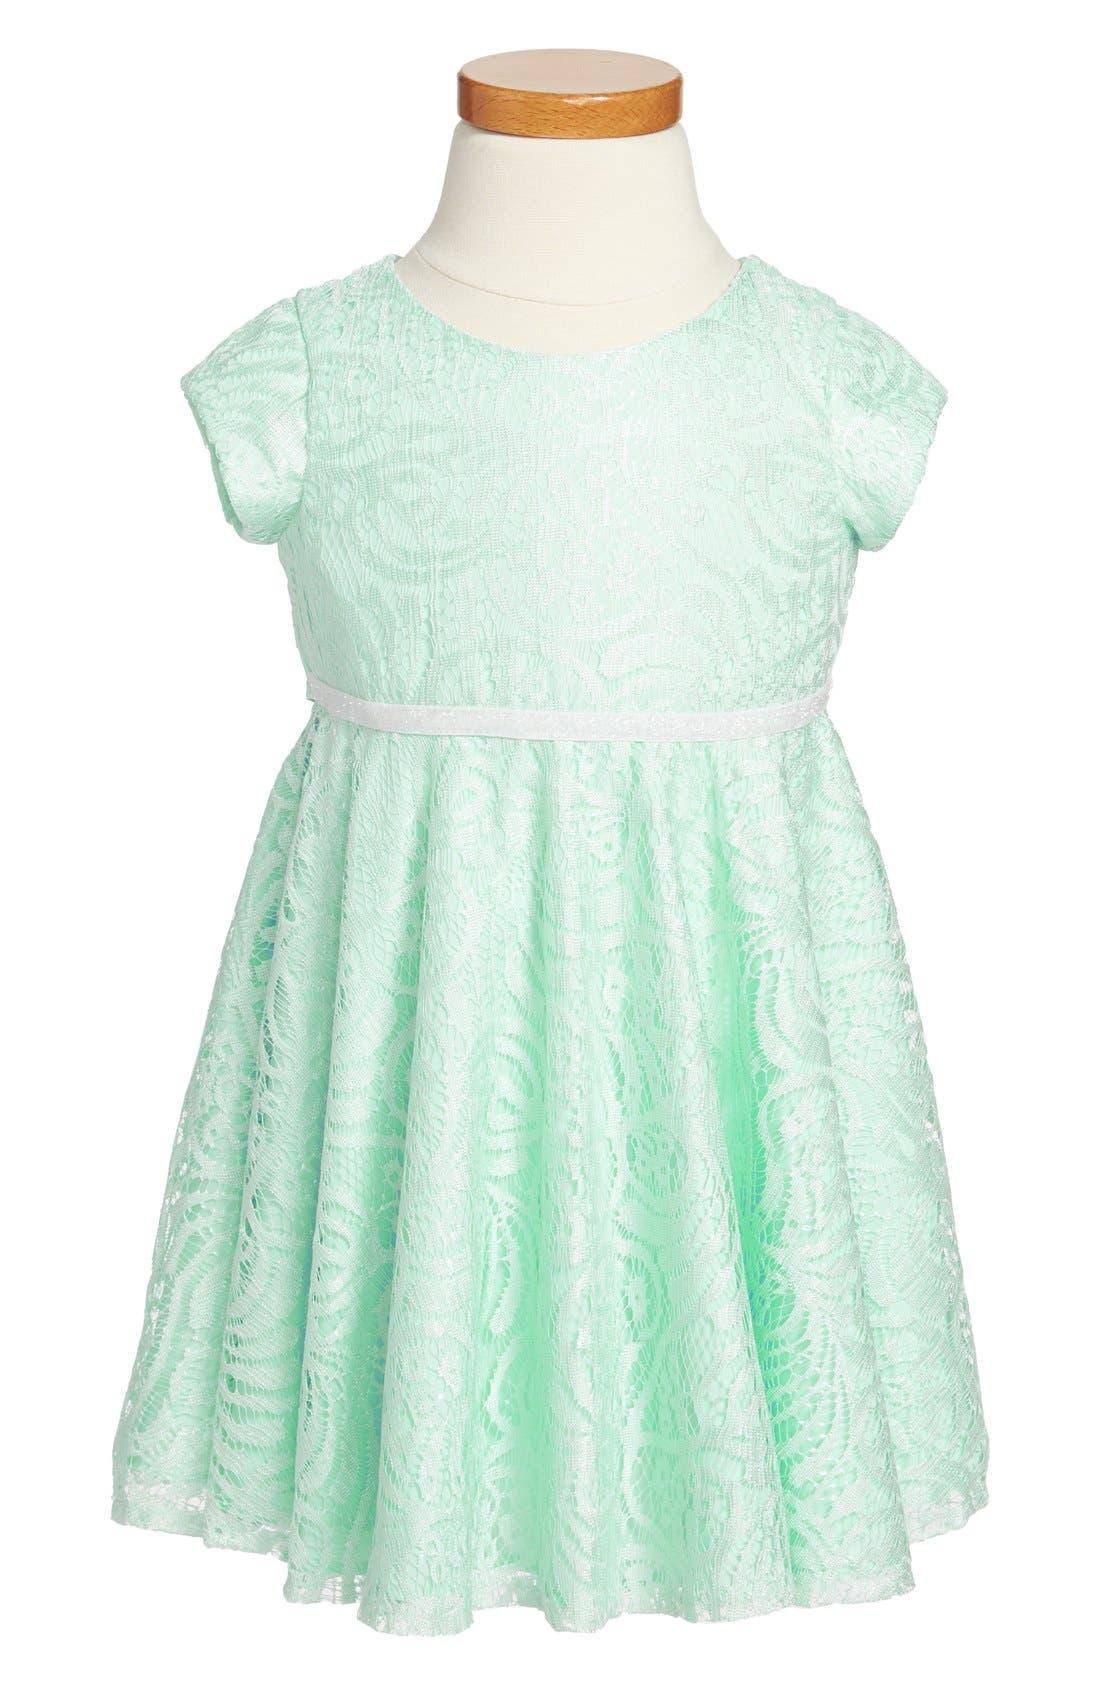 Alternate Image 1 Selected - Pippa & Julie Lace Skater Dress (Toddler Girls)